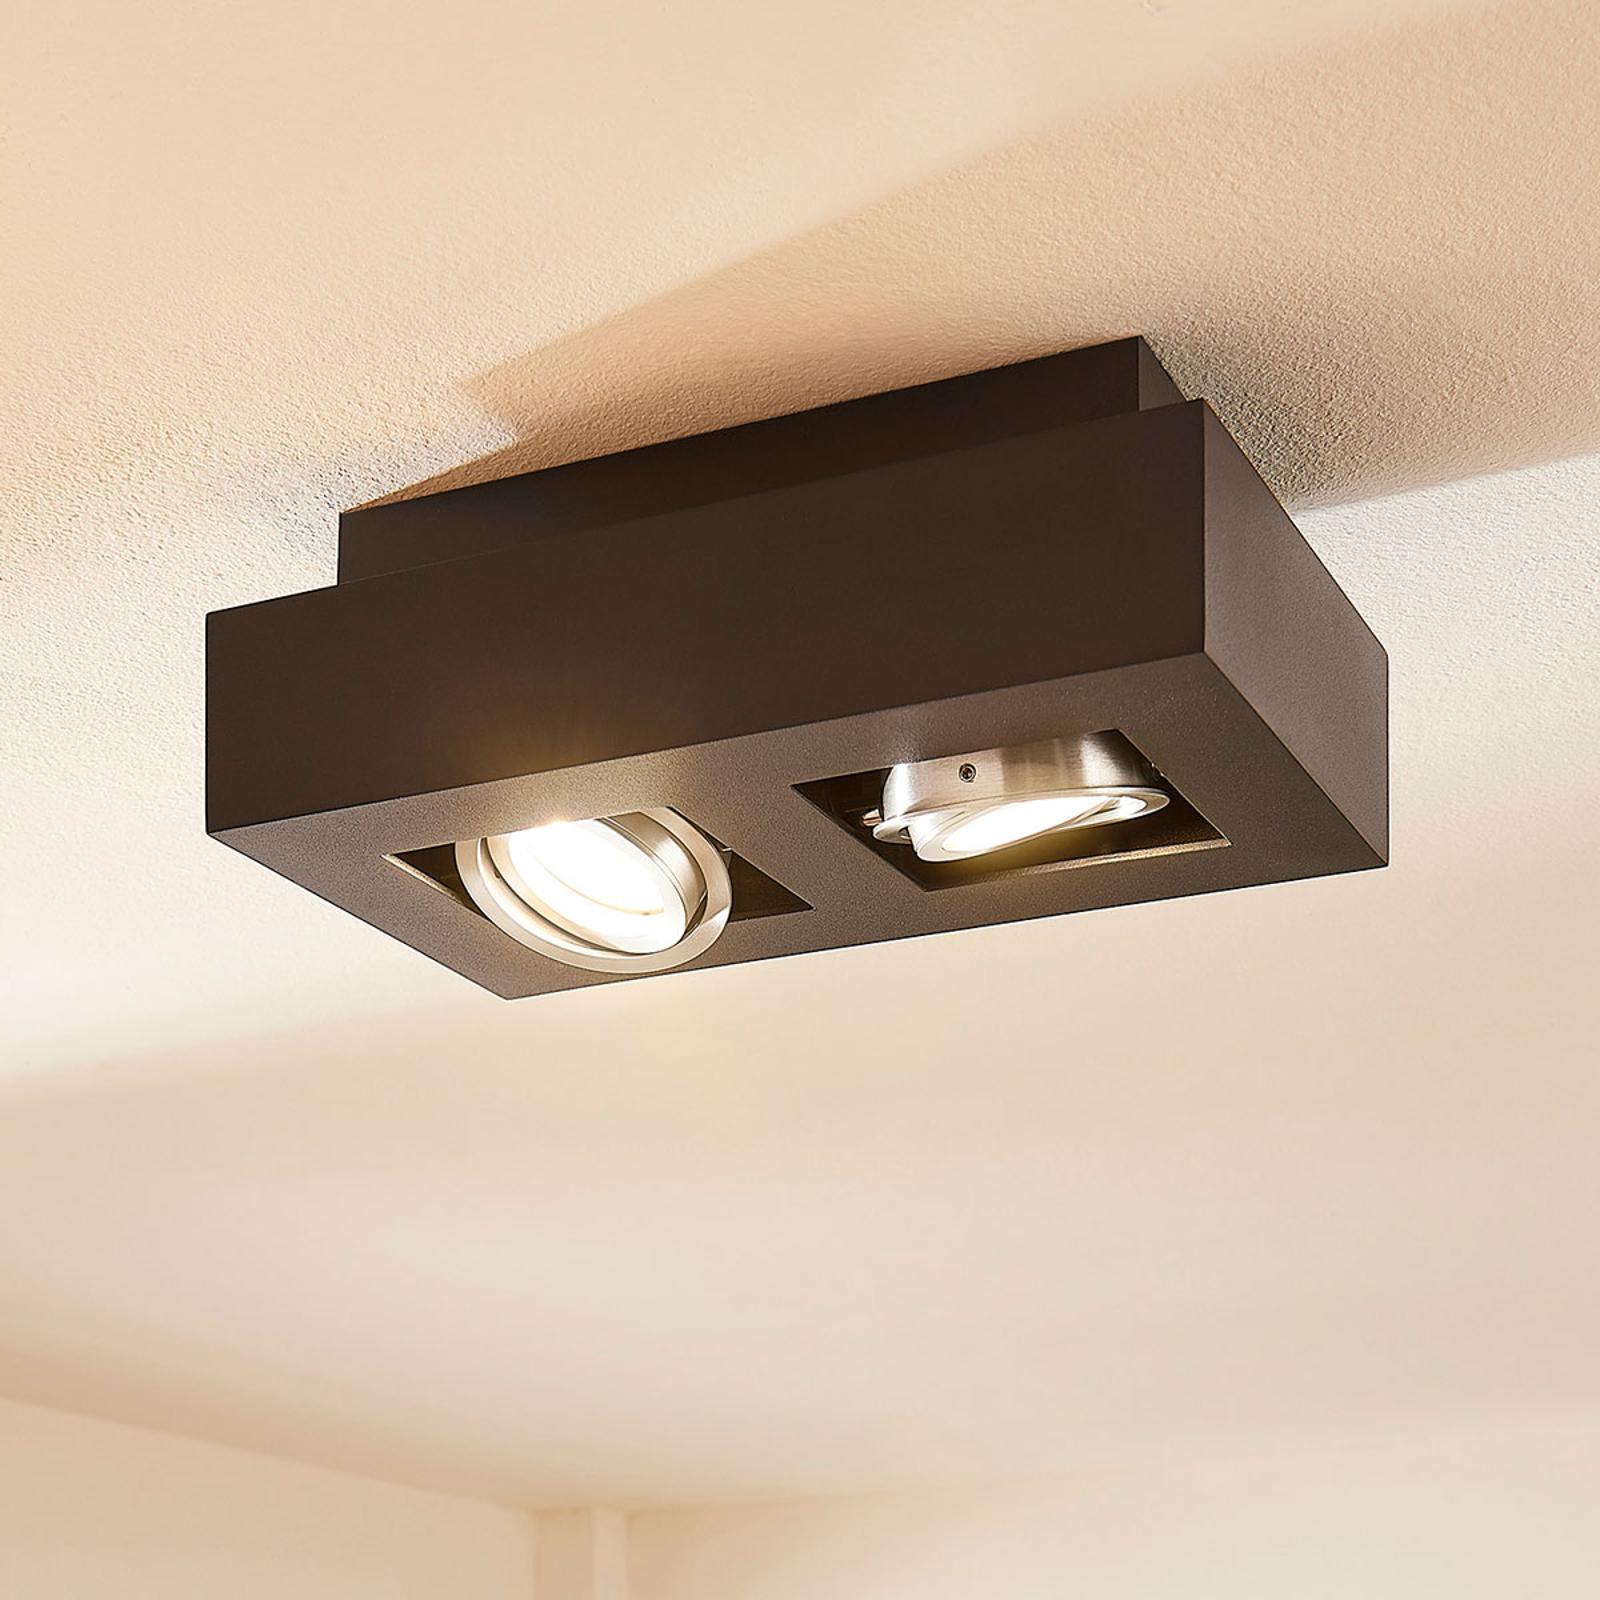 Lampa sufitowa LED Vince, 25x14cm czarna